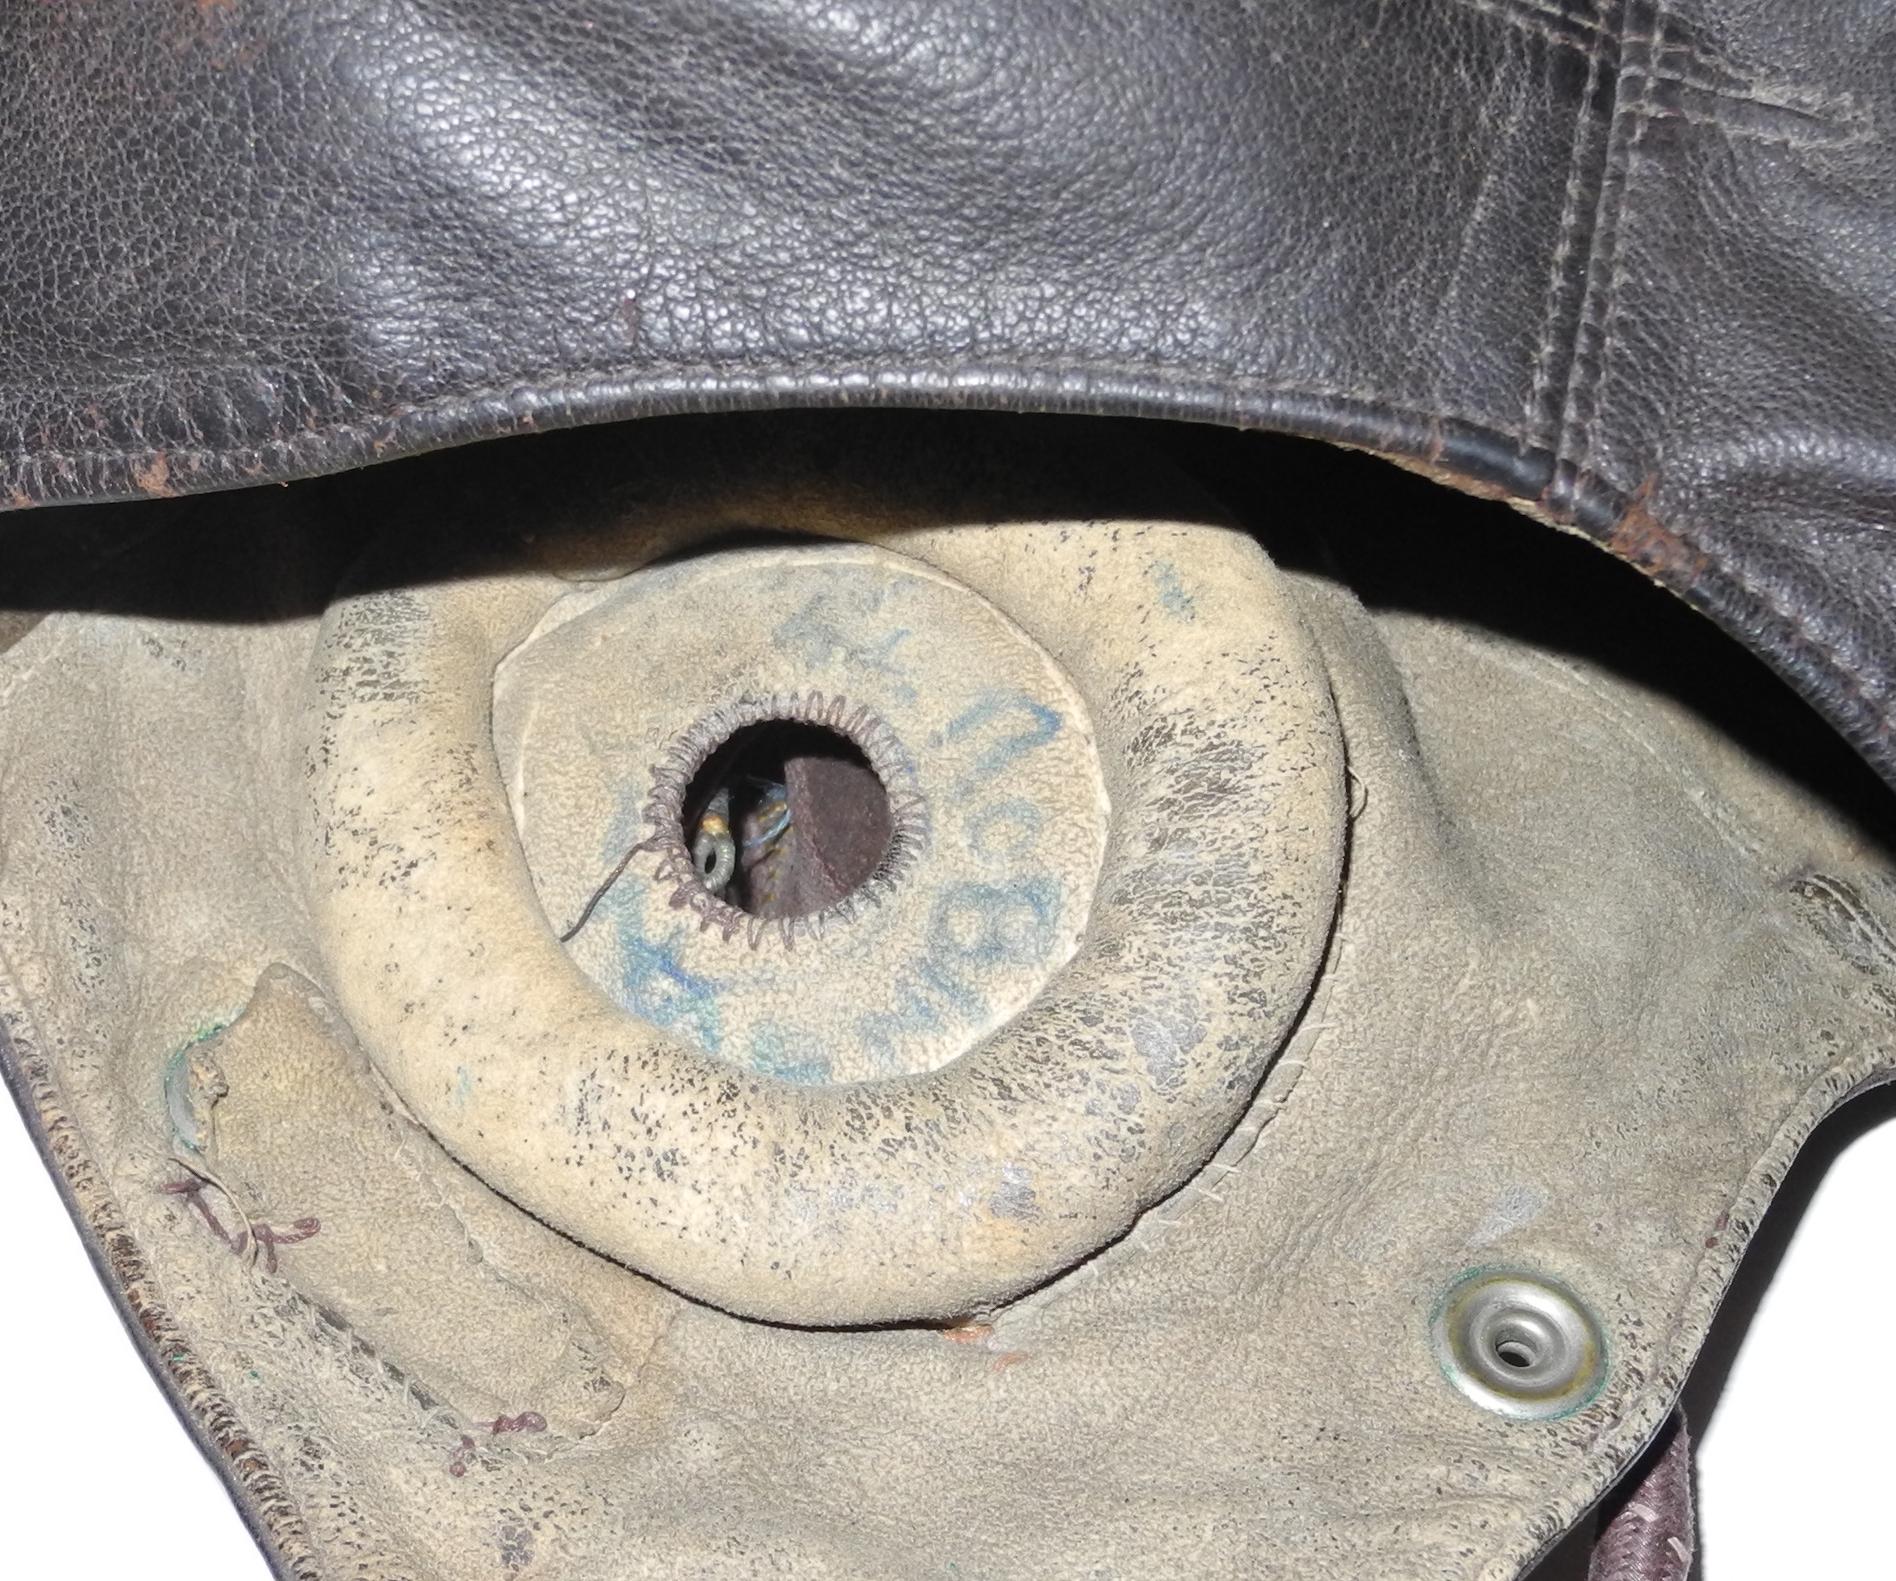 RN Fleet Air Arm Type C helmet with internal wiring